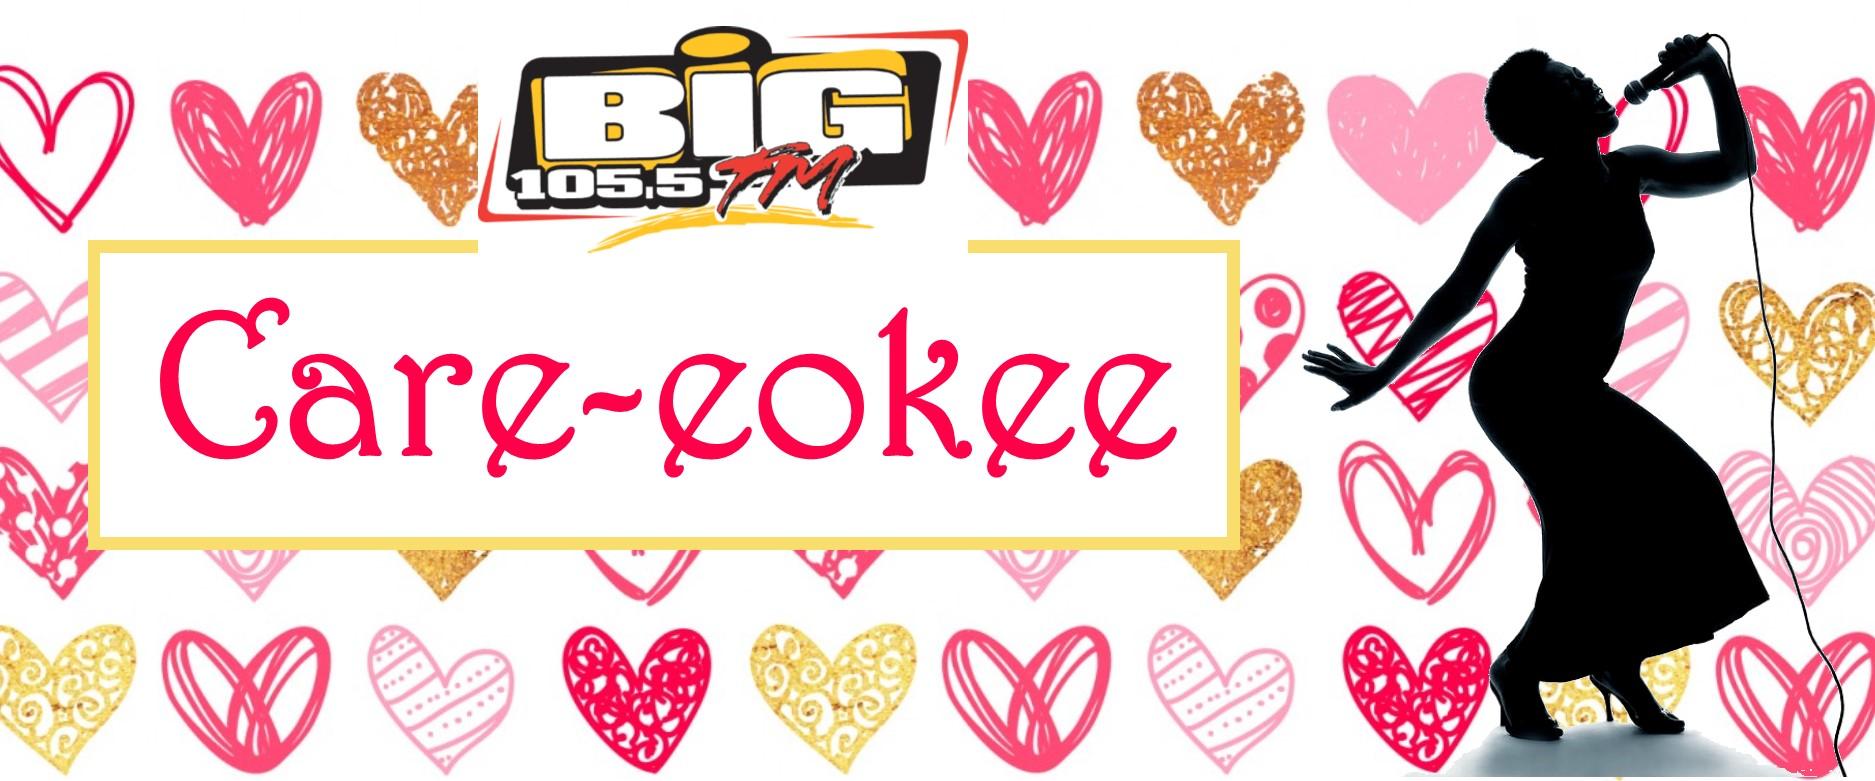 Care-eokee